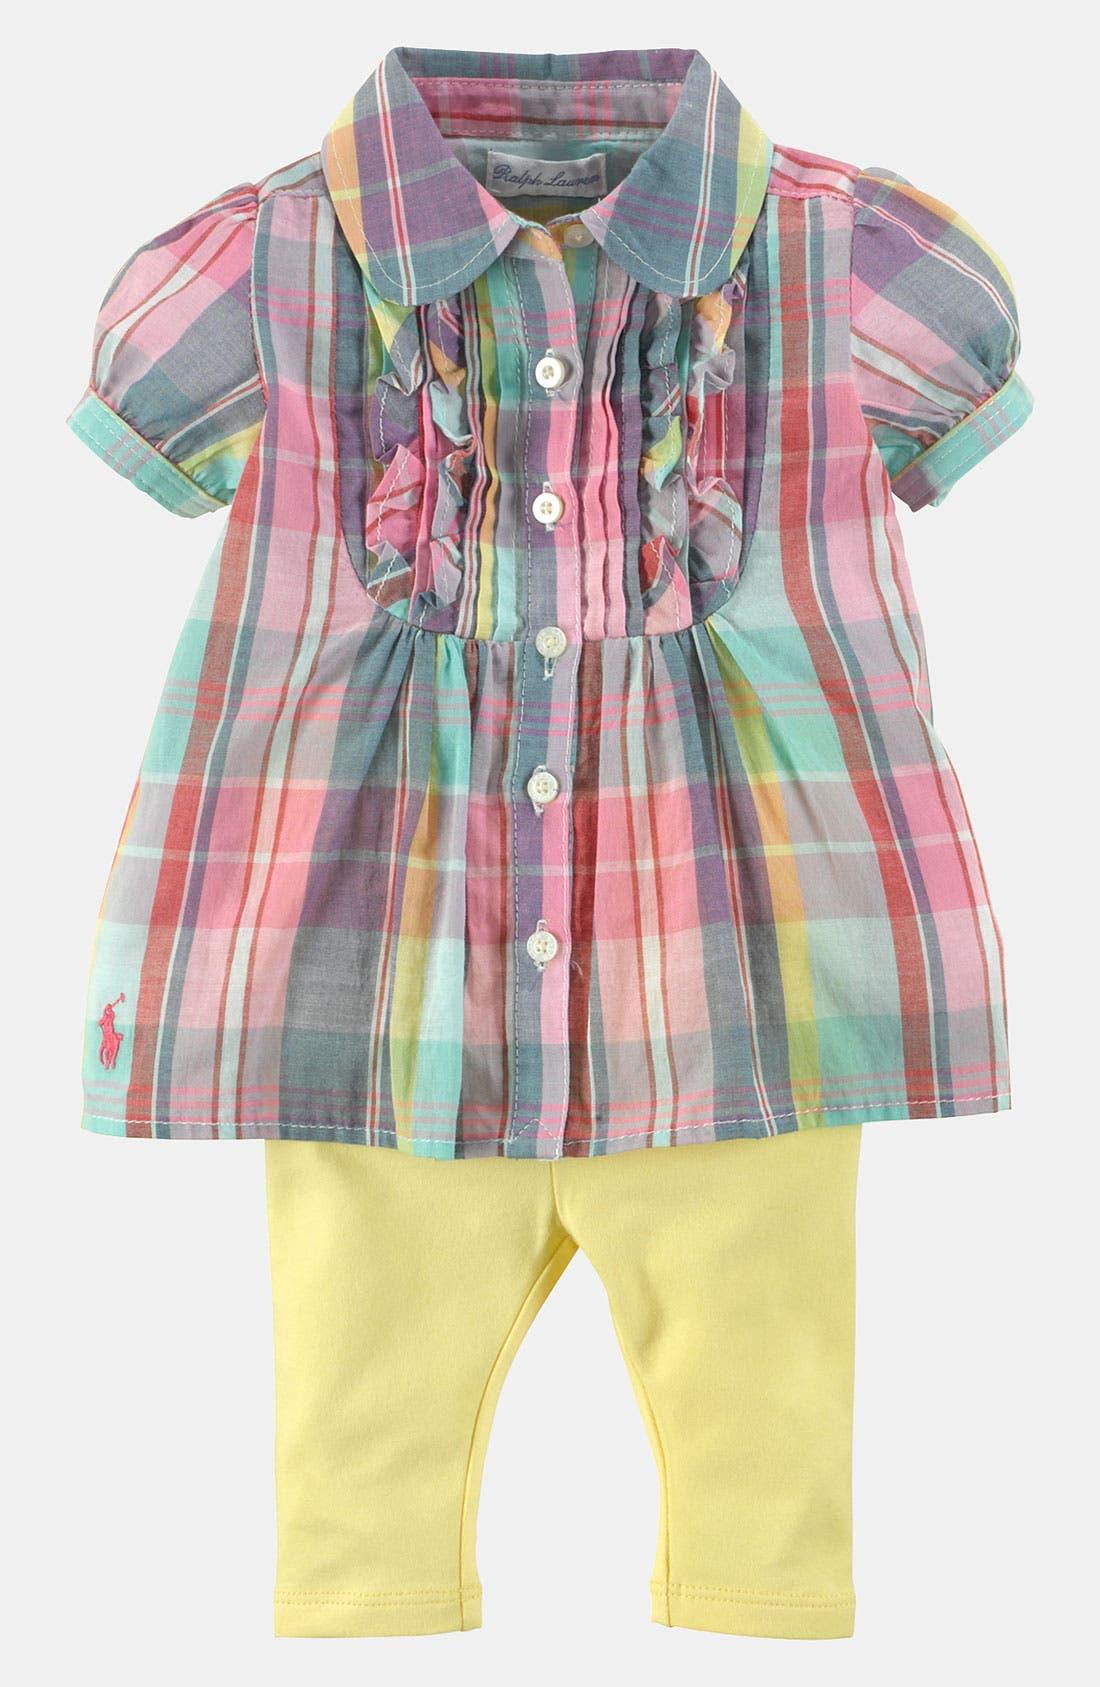 Alternate Image 1 Selected - Ralph Lauren Madras Plaid Tunic & Leggings (Baby)